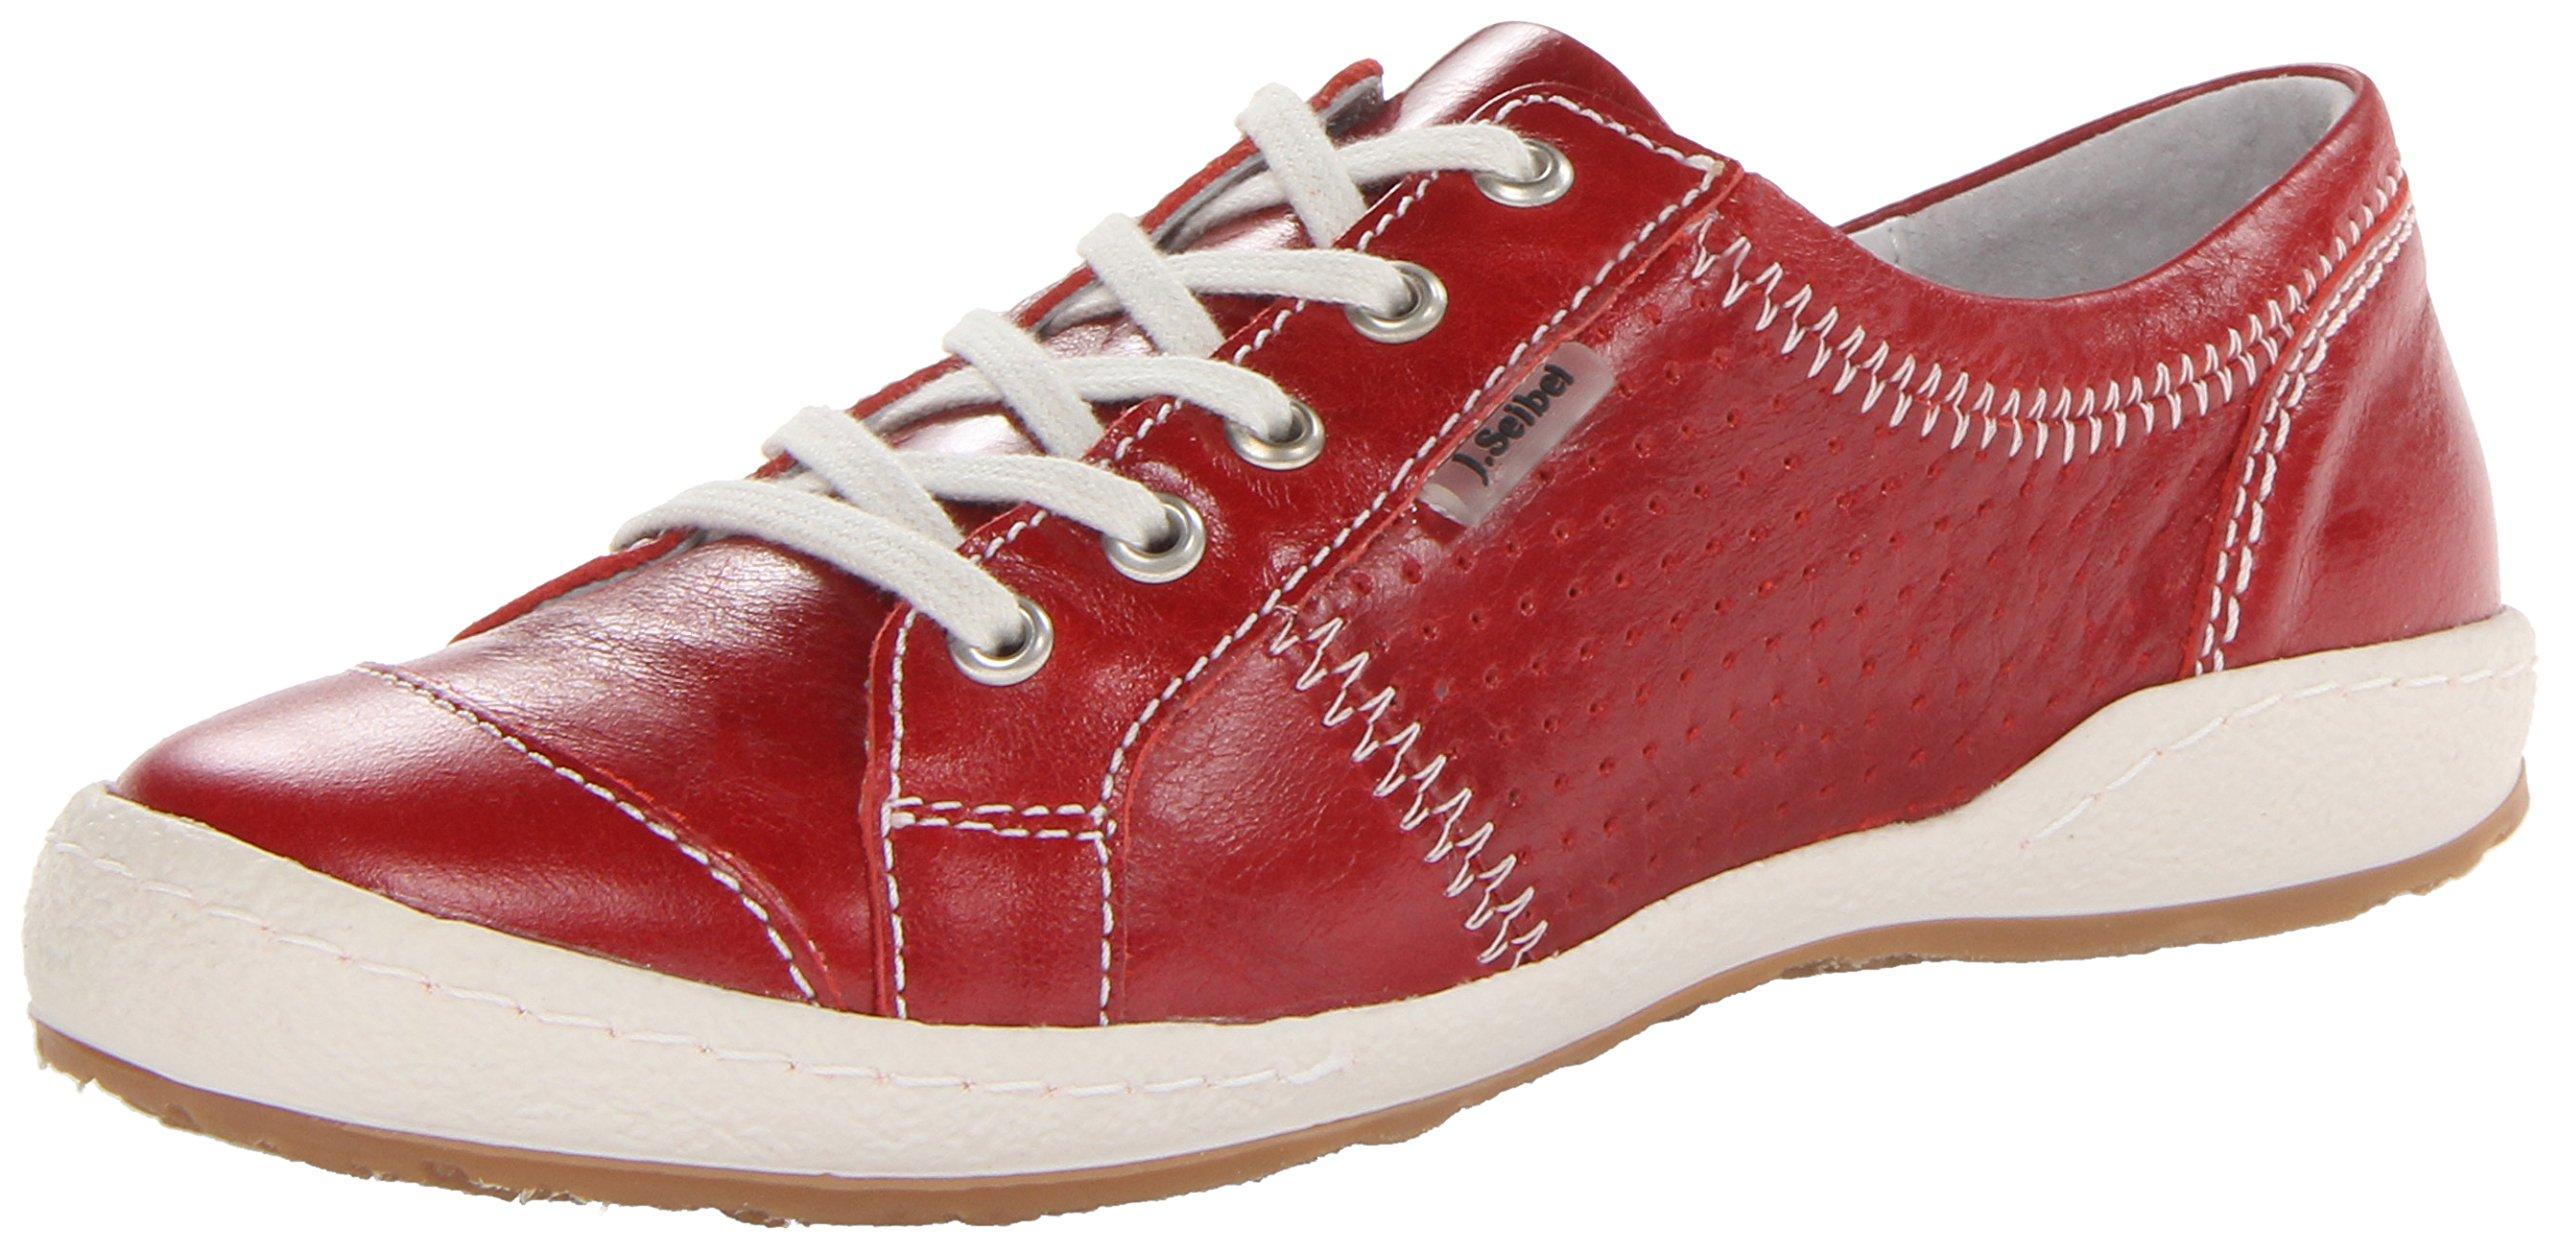 Josef Seibel Women's Caspian Fashion Sneaker, Red, 39 EU/8-8.5 M US